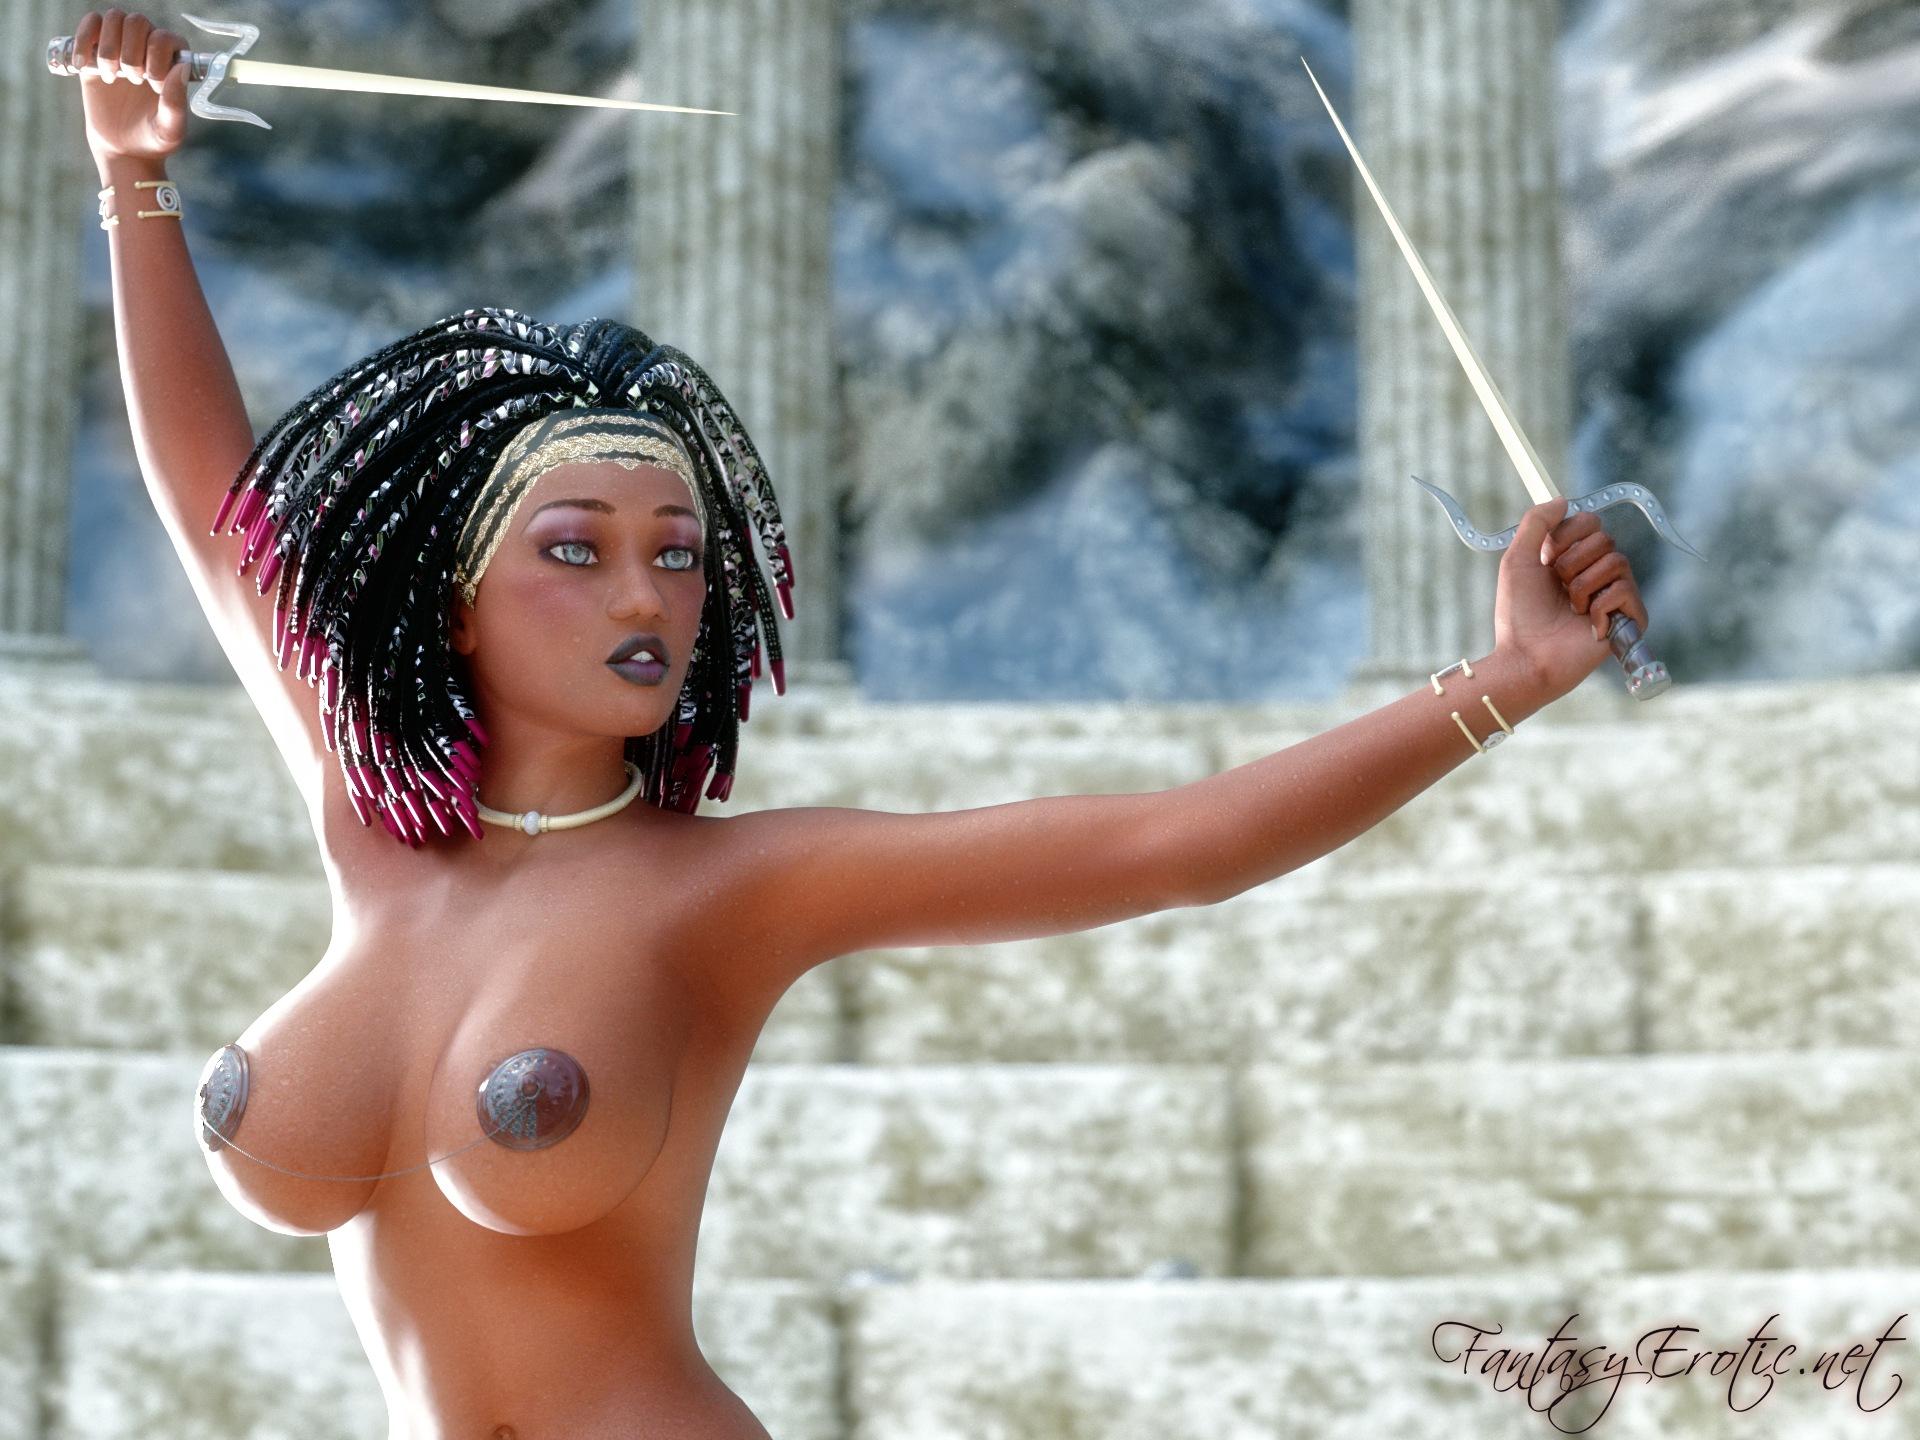 Fighter Shaleena